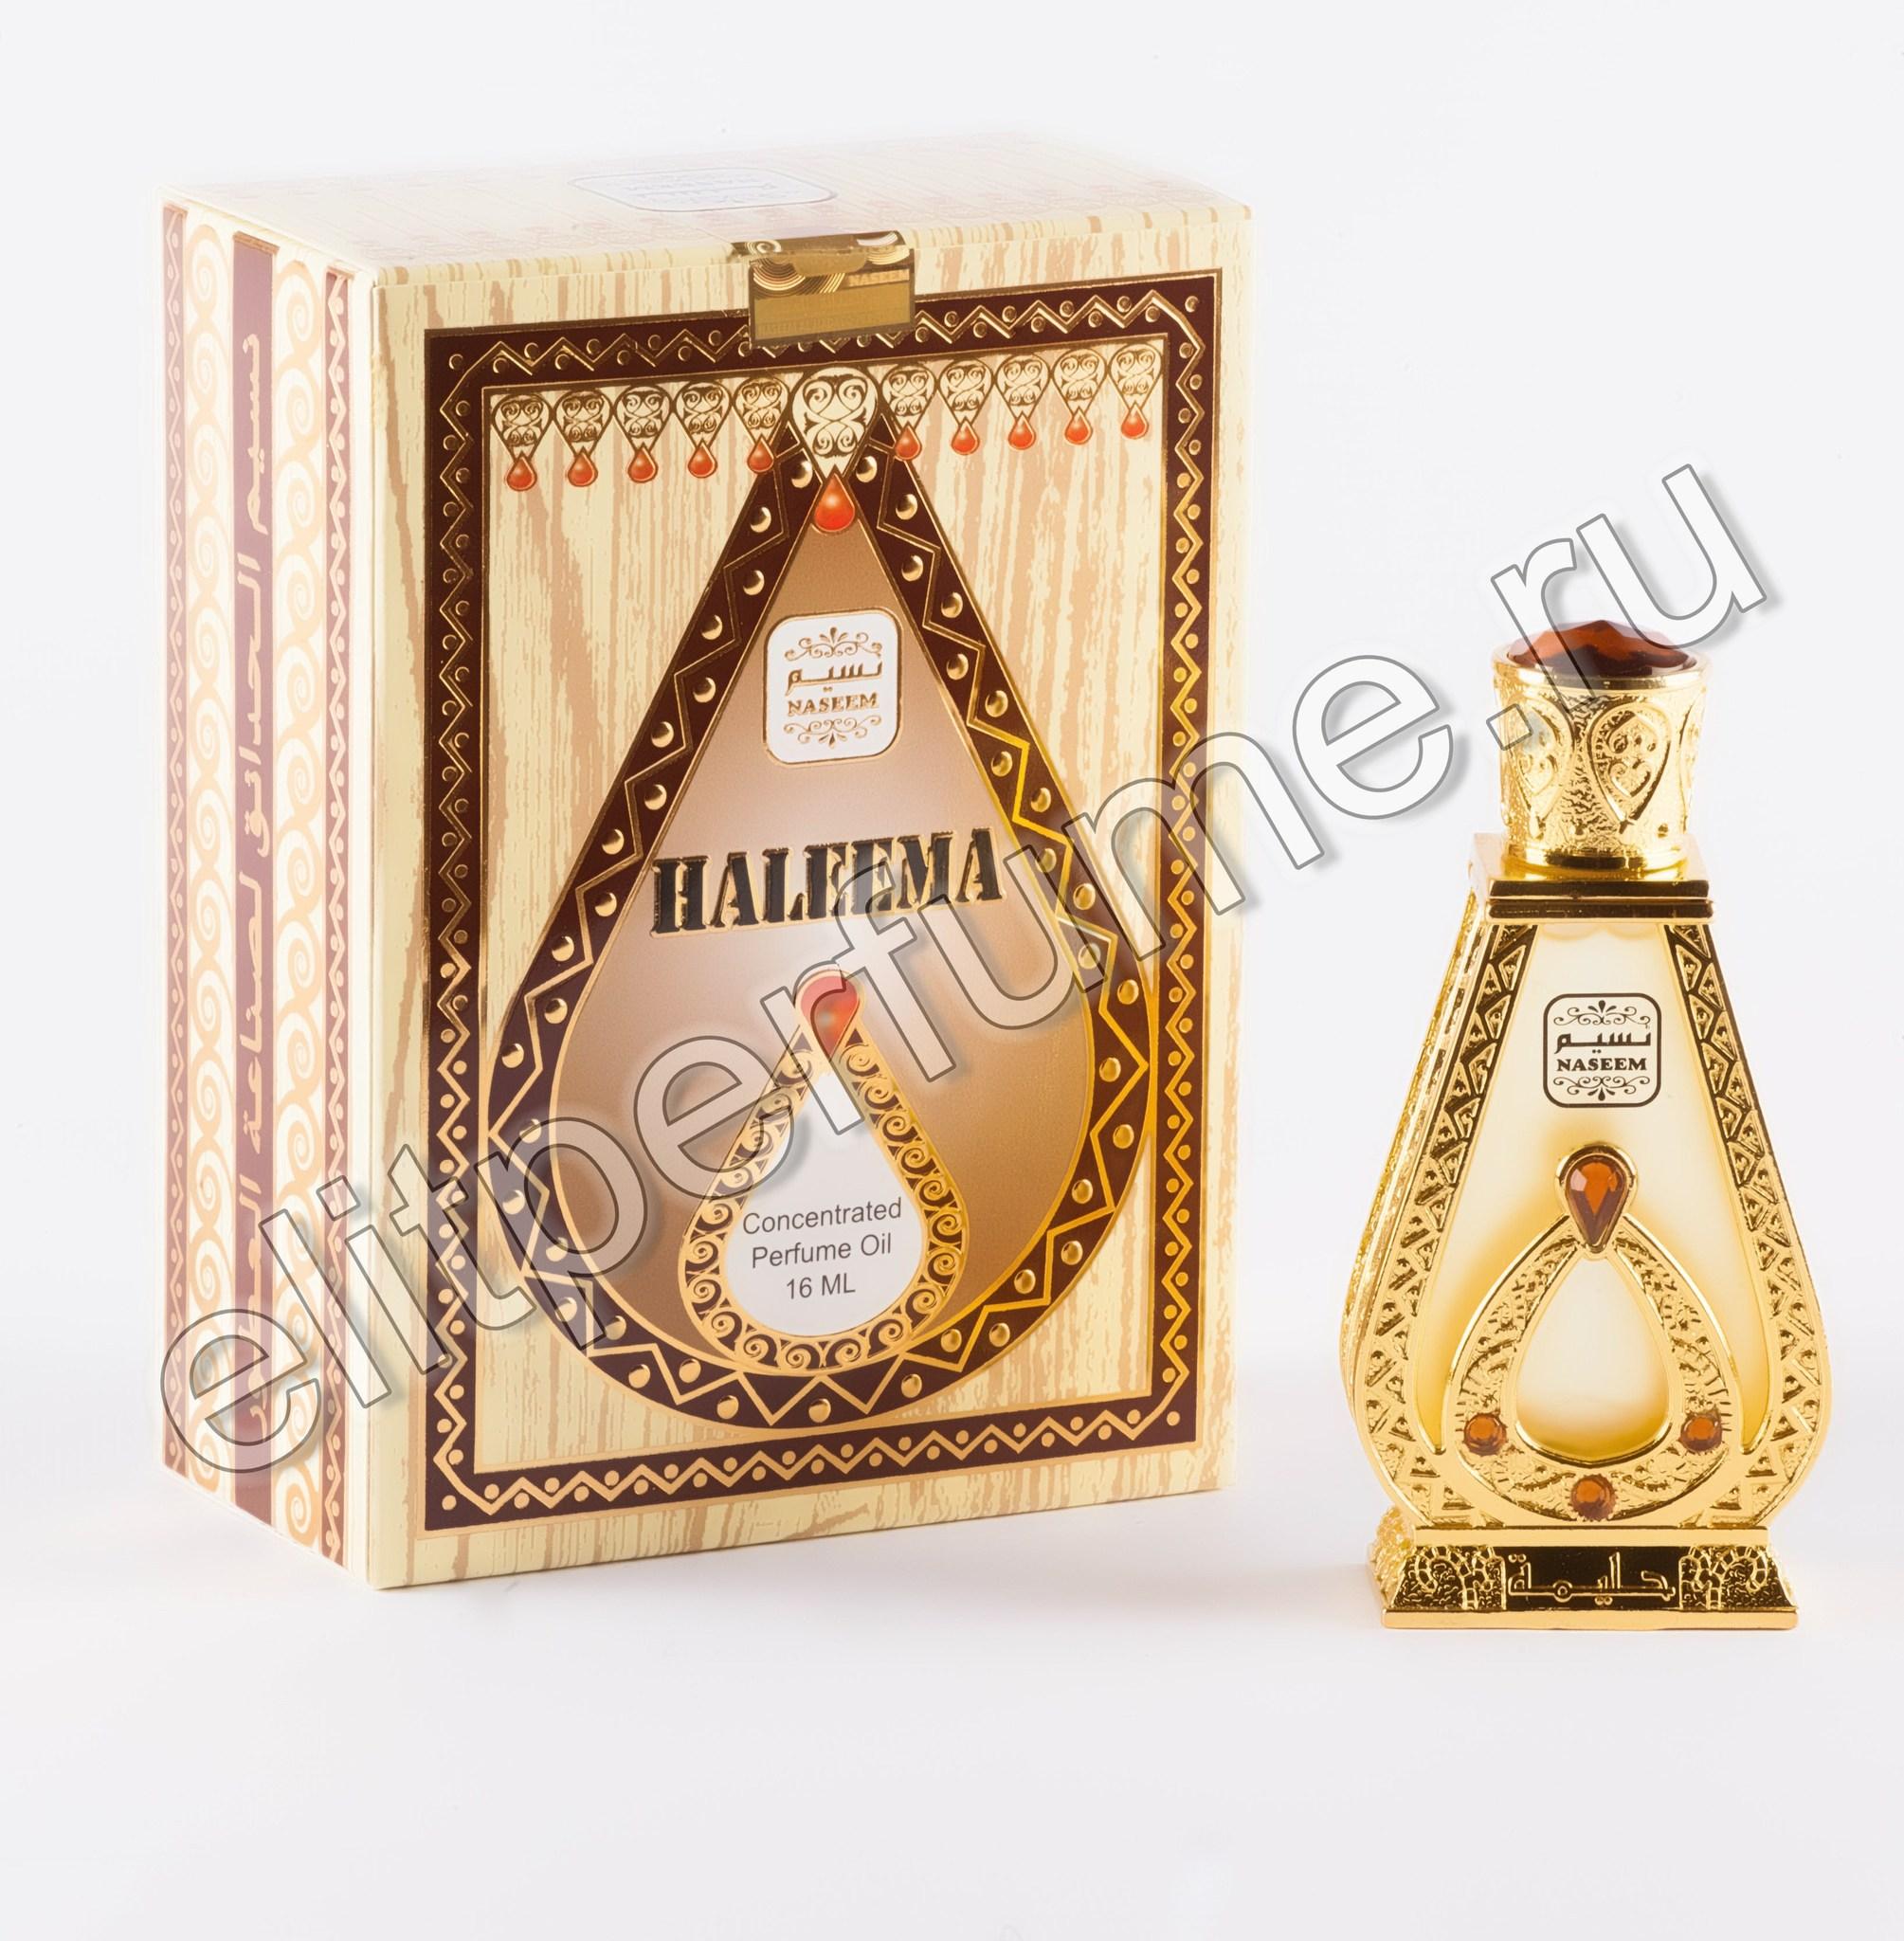 Haleema Халима 16 мл арабские масляные духи от Насим Naseem Perfumes